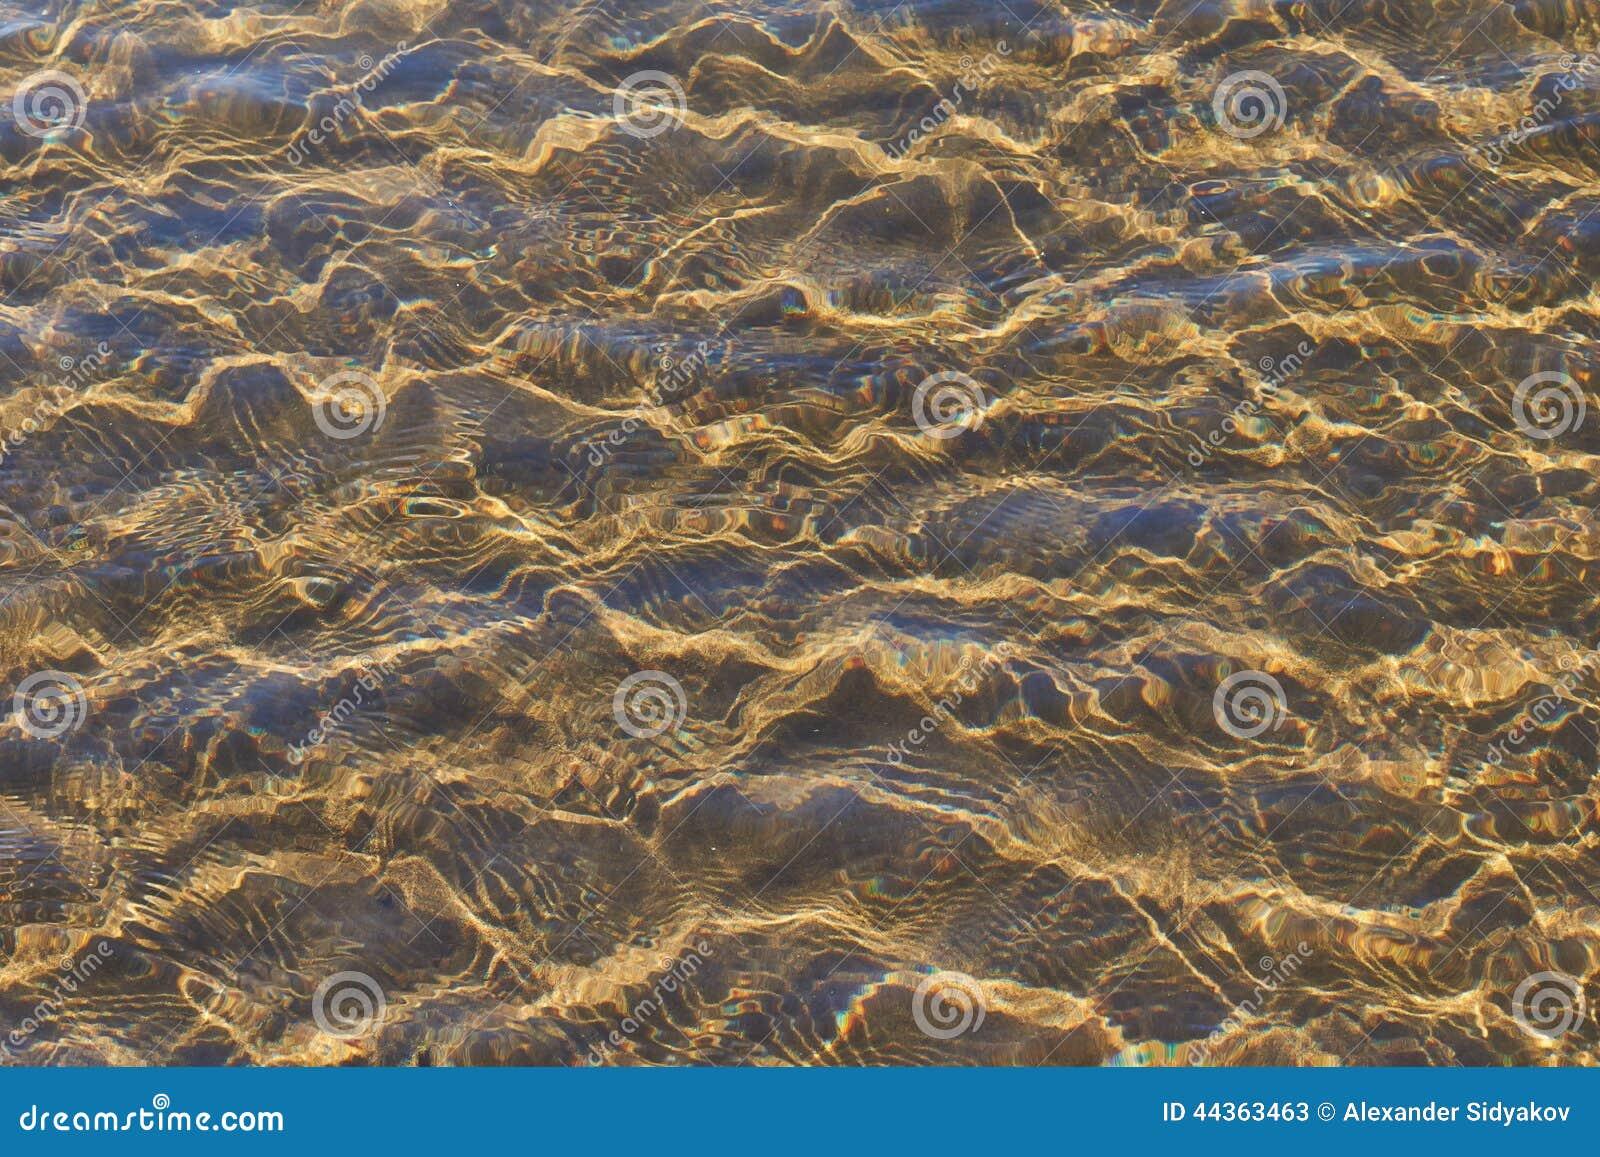 Onde su una spiaggia sabbiosa